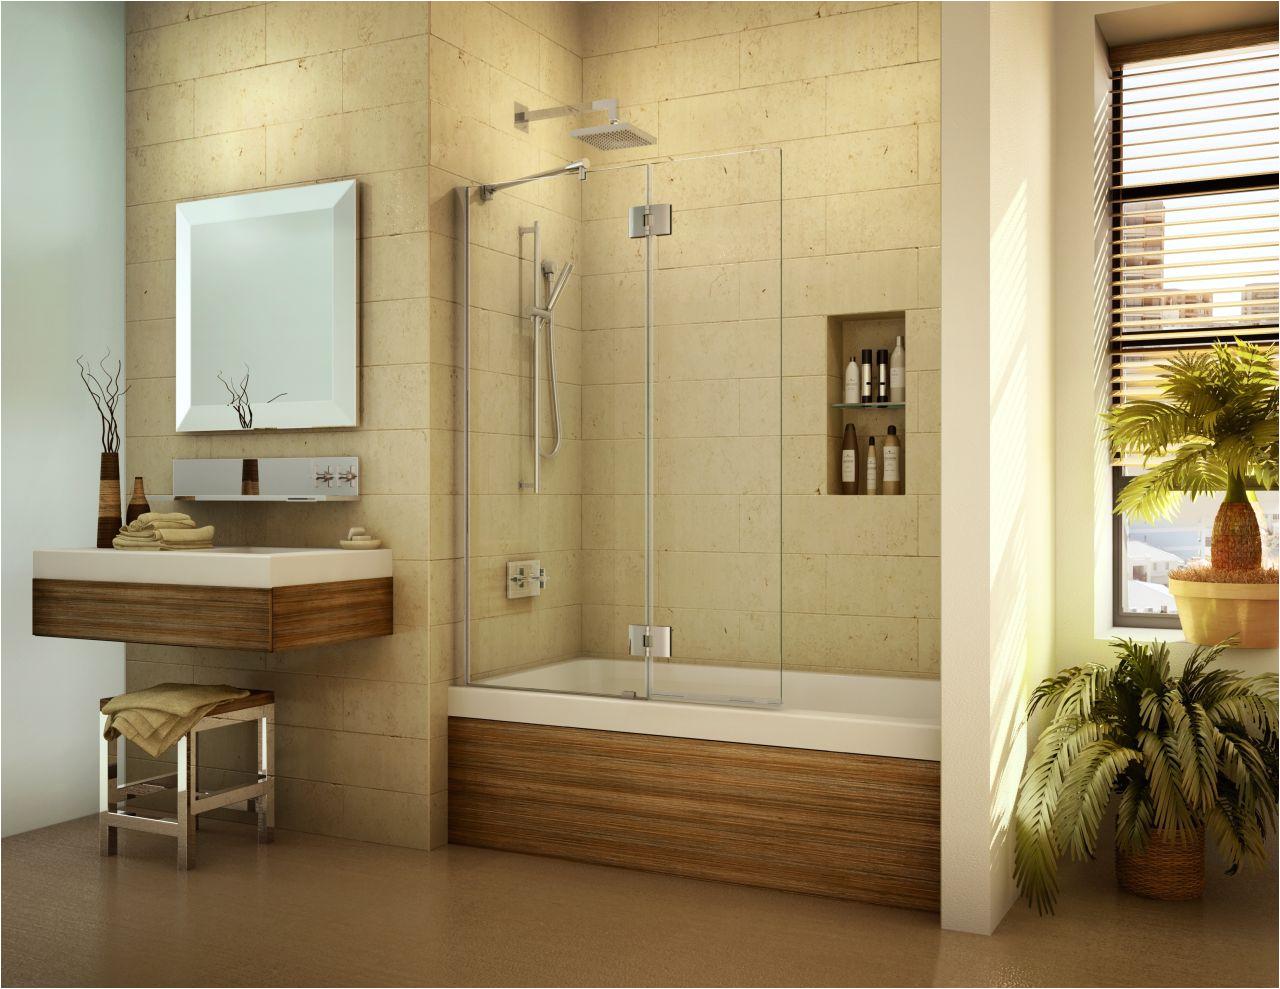 Bathtub Alcove Remodel Bathtub & Shower Alcove Remodeling Ideas Cleveland Akron